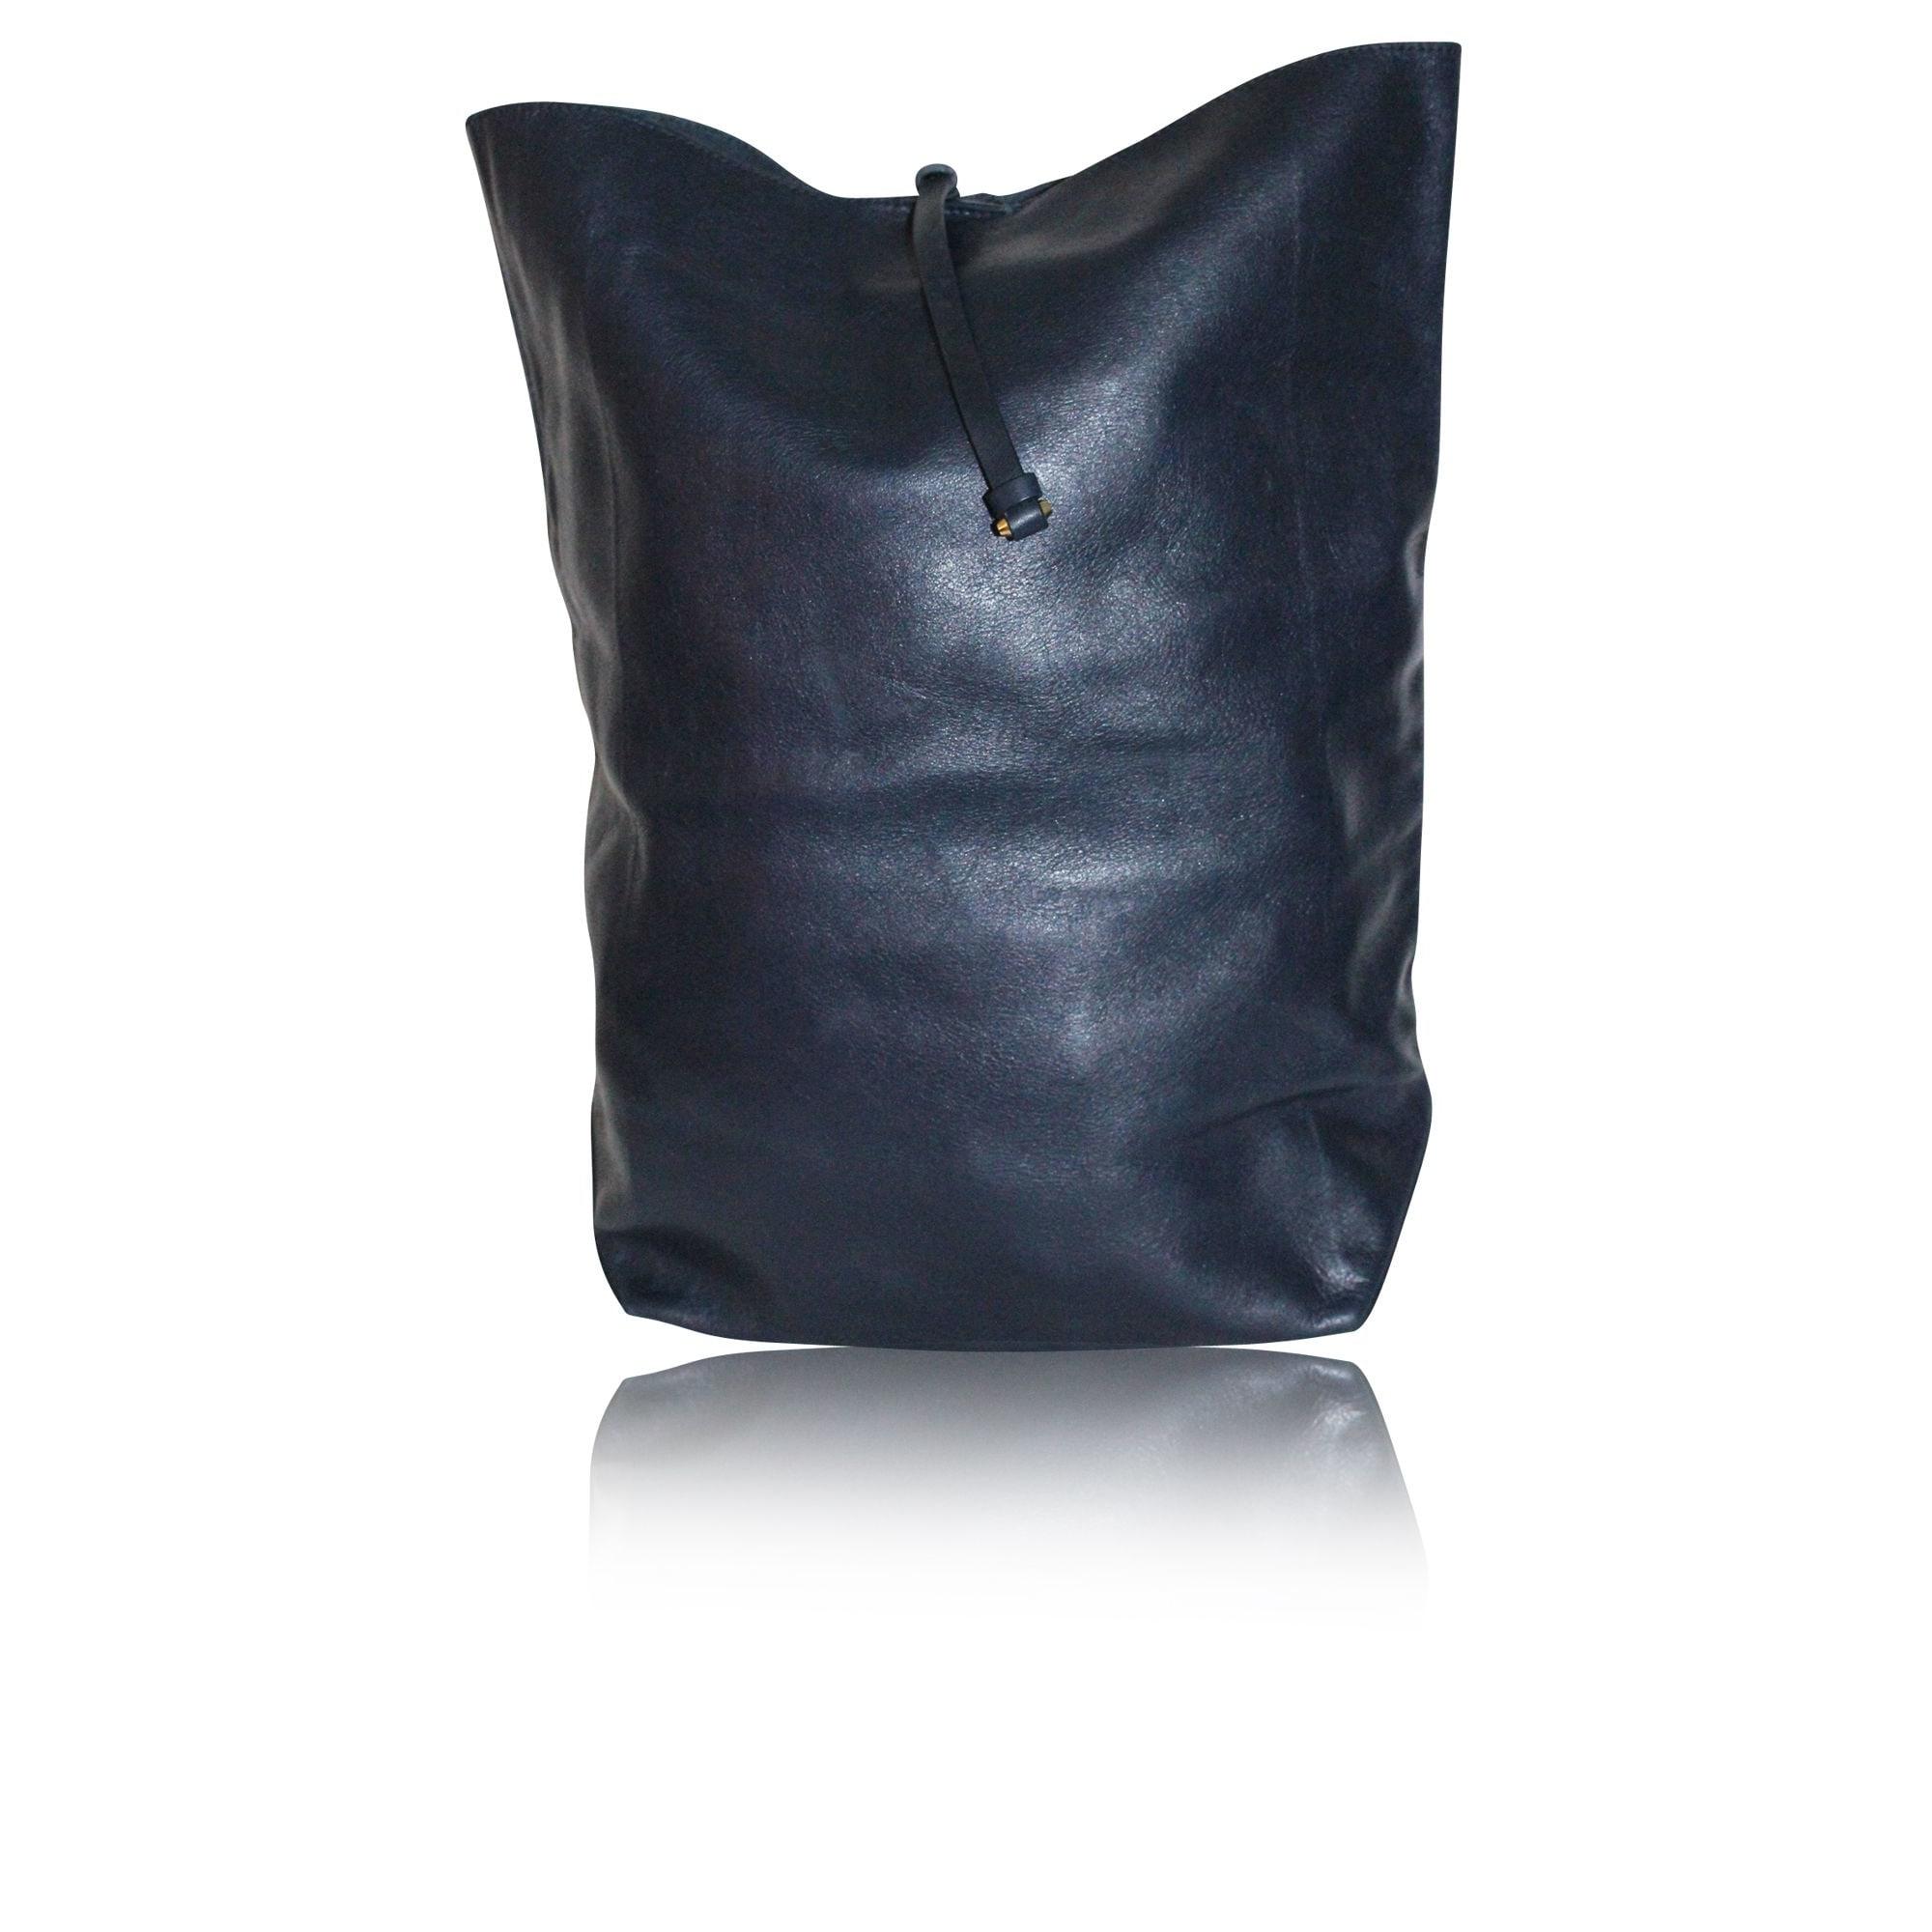 Sac pochette en cuir JIL SANDER Bleu, bleu marine, bleu turquoise